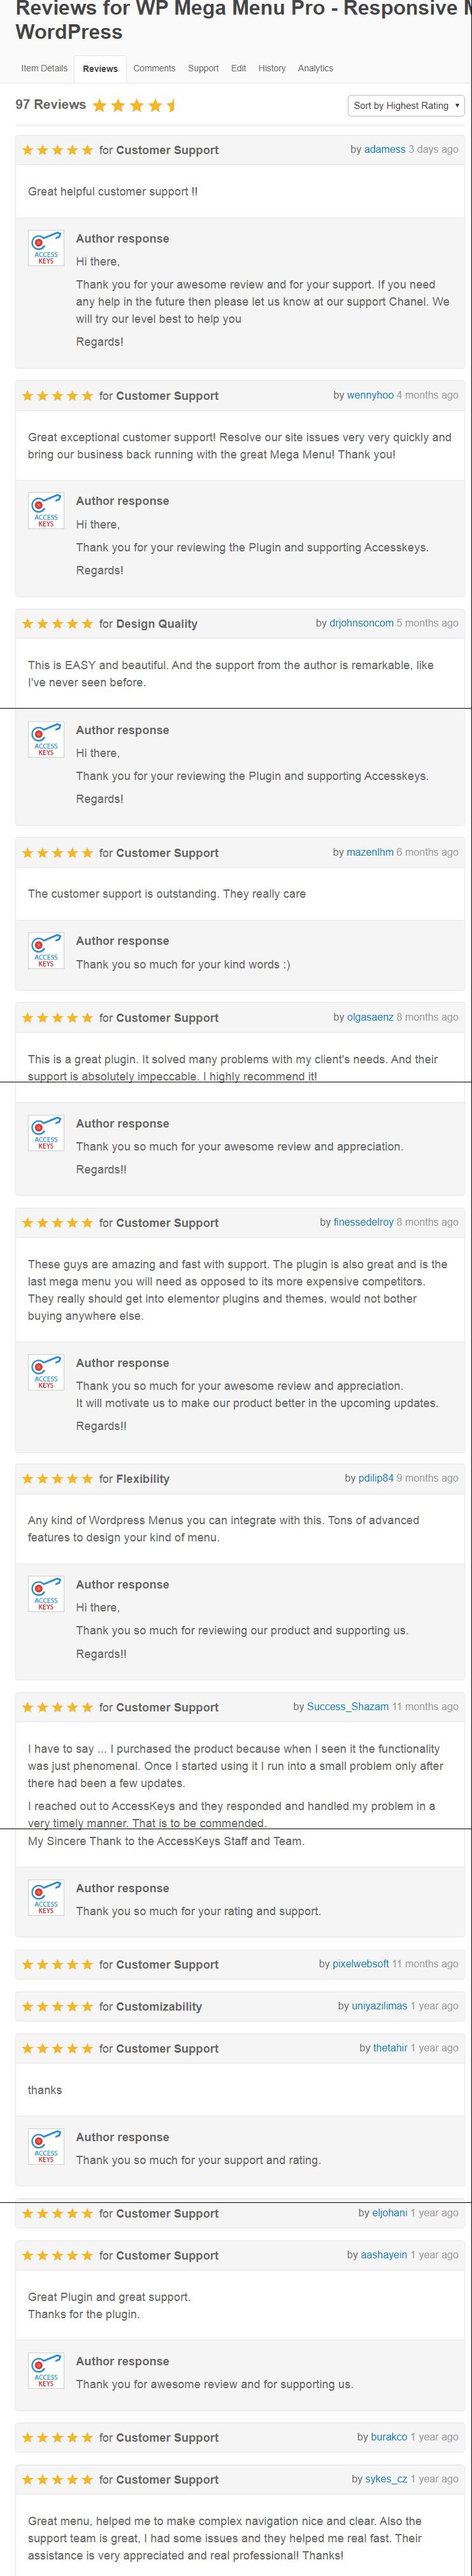 WP Mega Menu - Customers Review